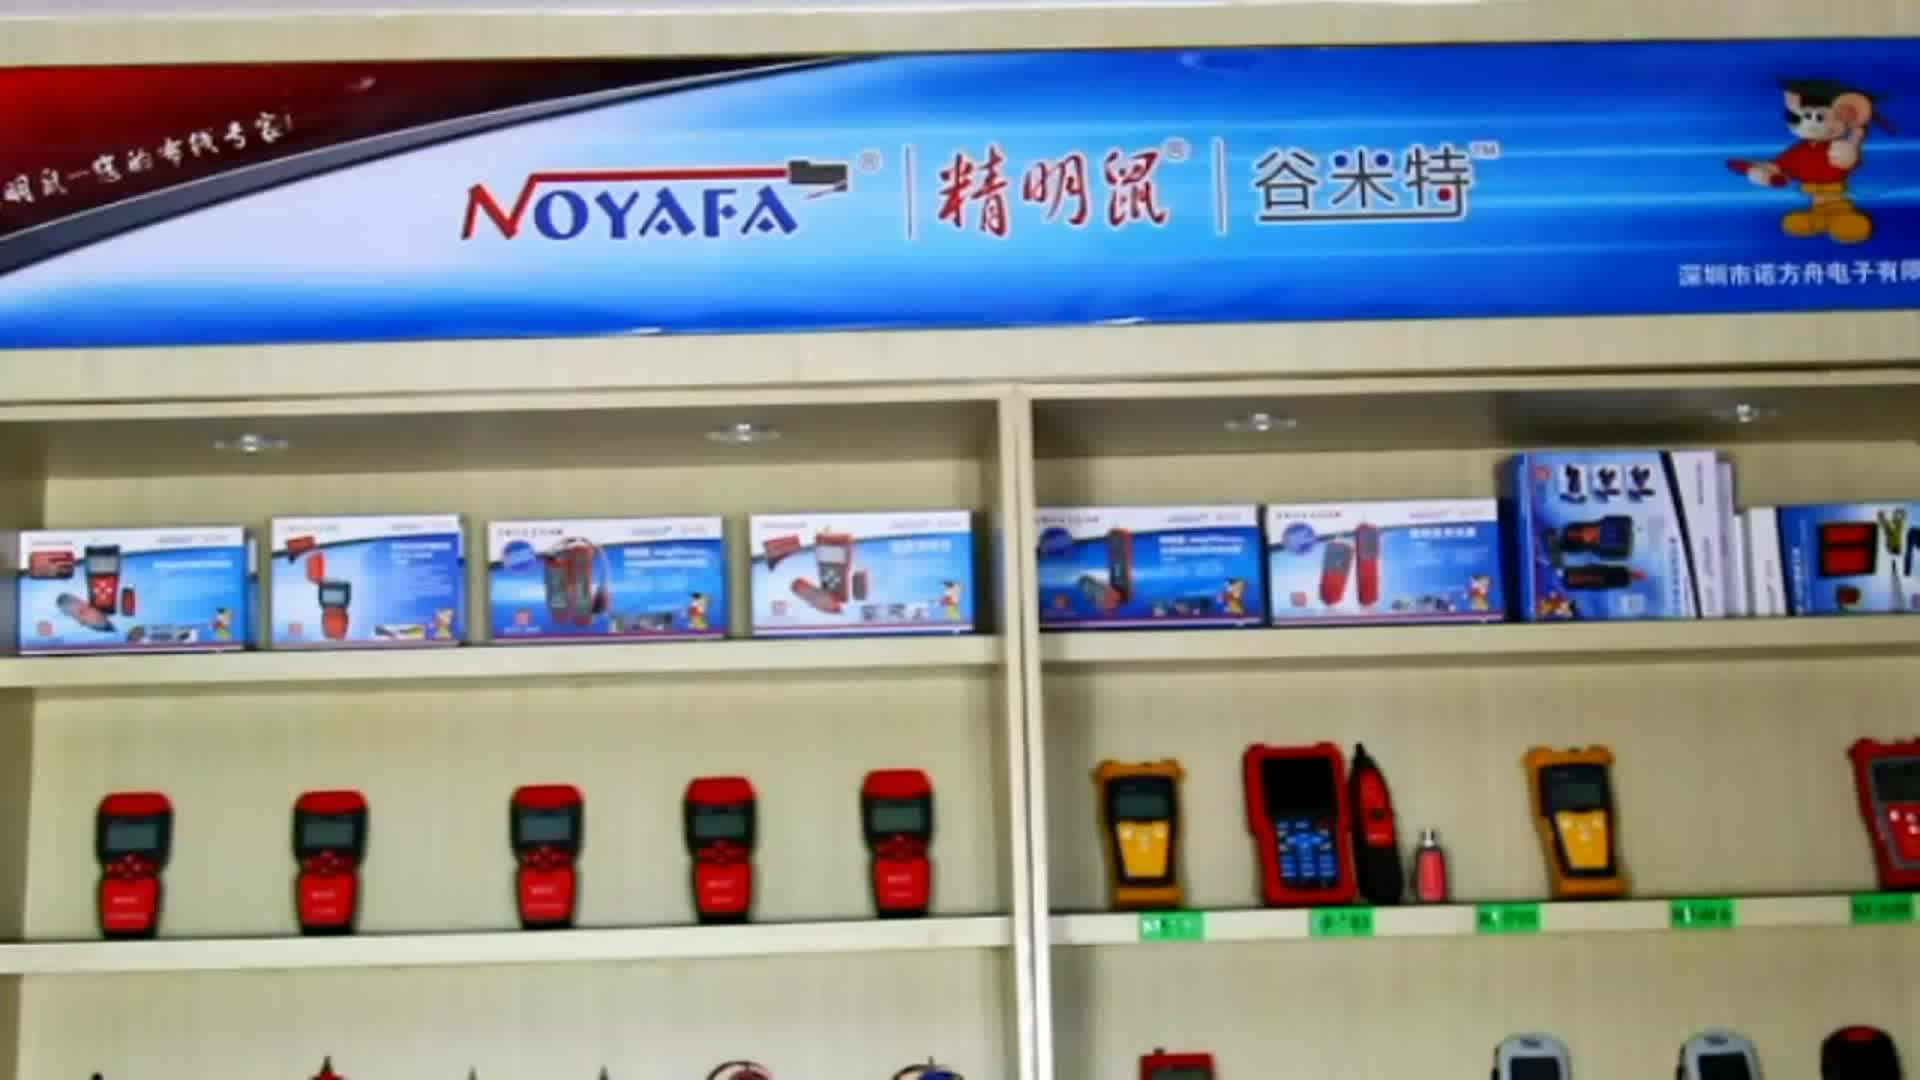 NOYAFA NF-308 다기능 와이어 추적기, 톤 케이블 테스터